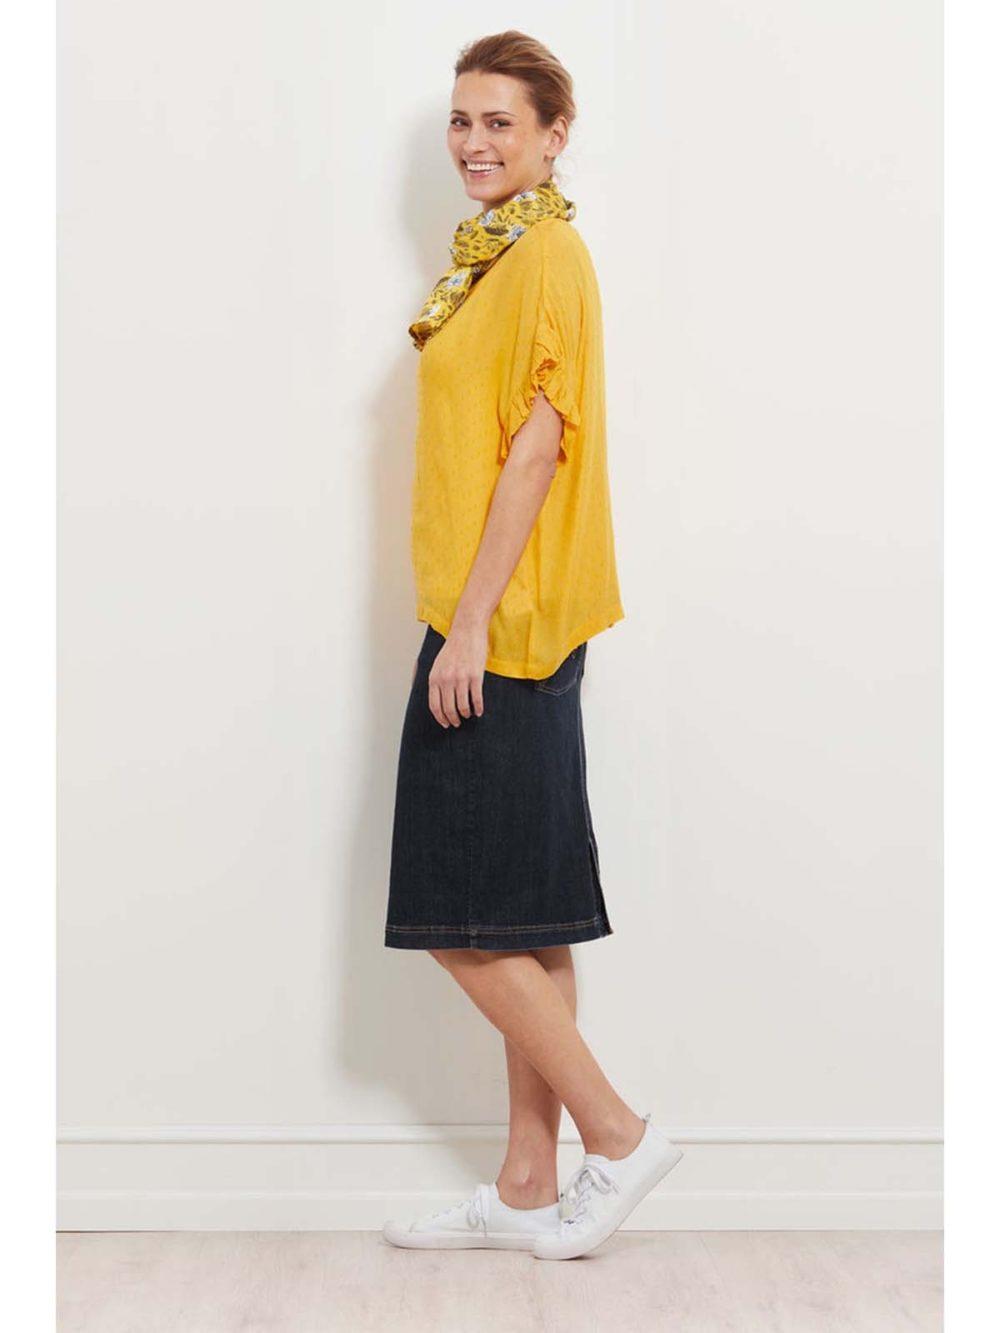 Saba Skirt Masai Clothing Katie Kerr Womens Clothing